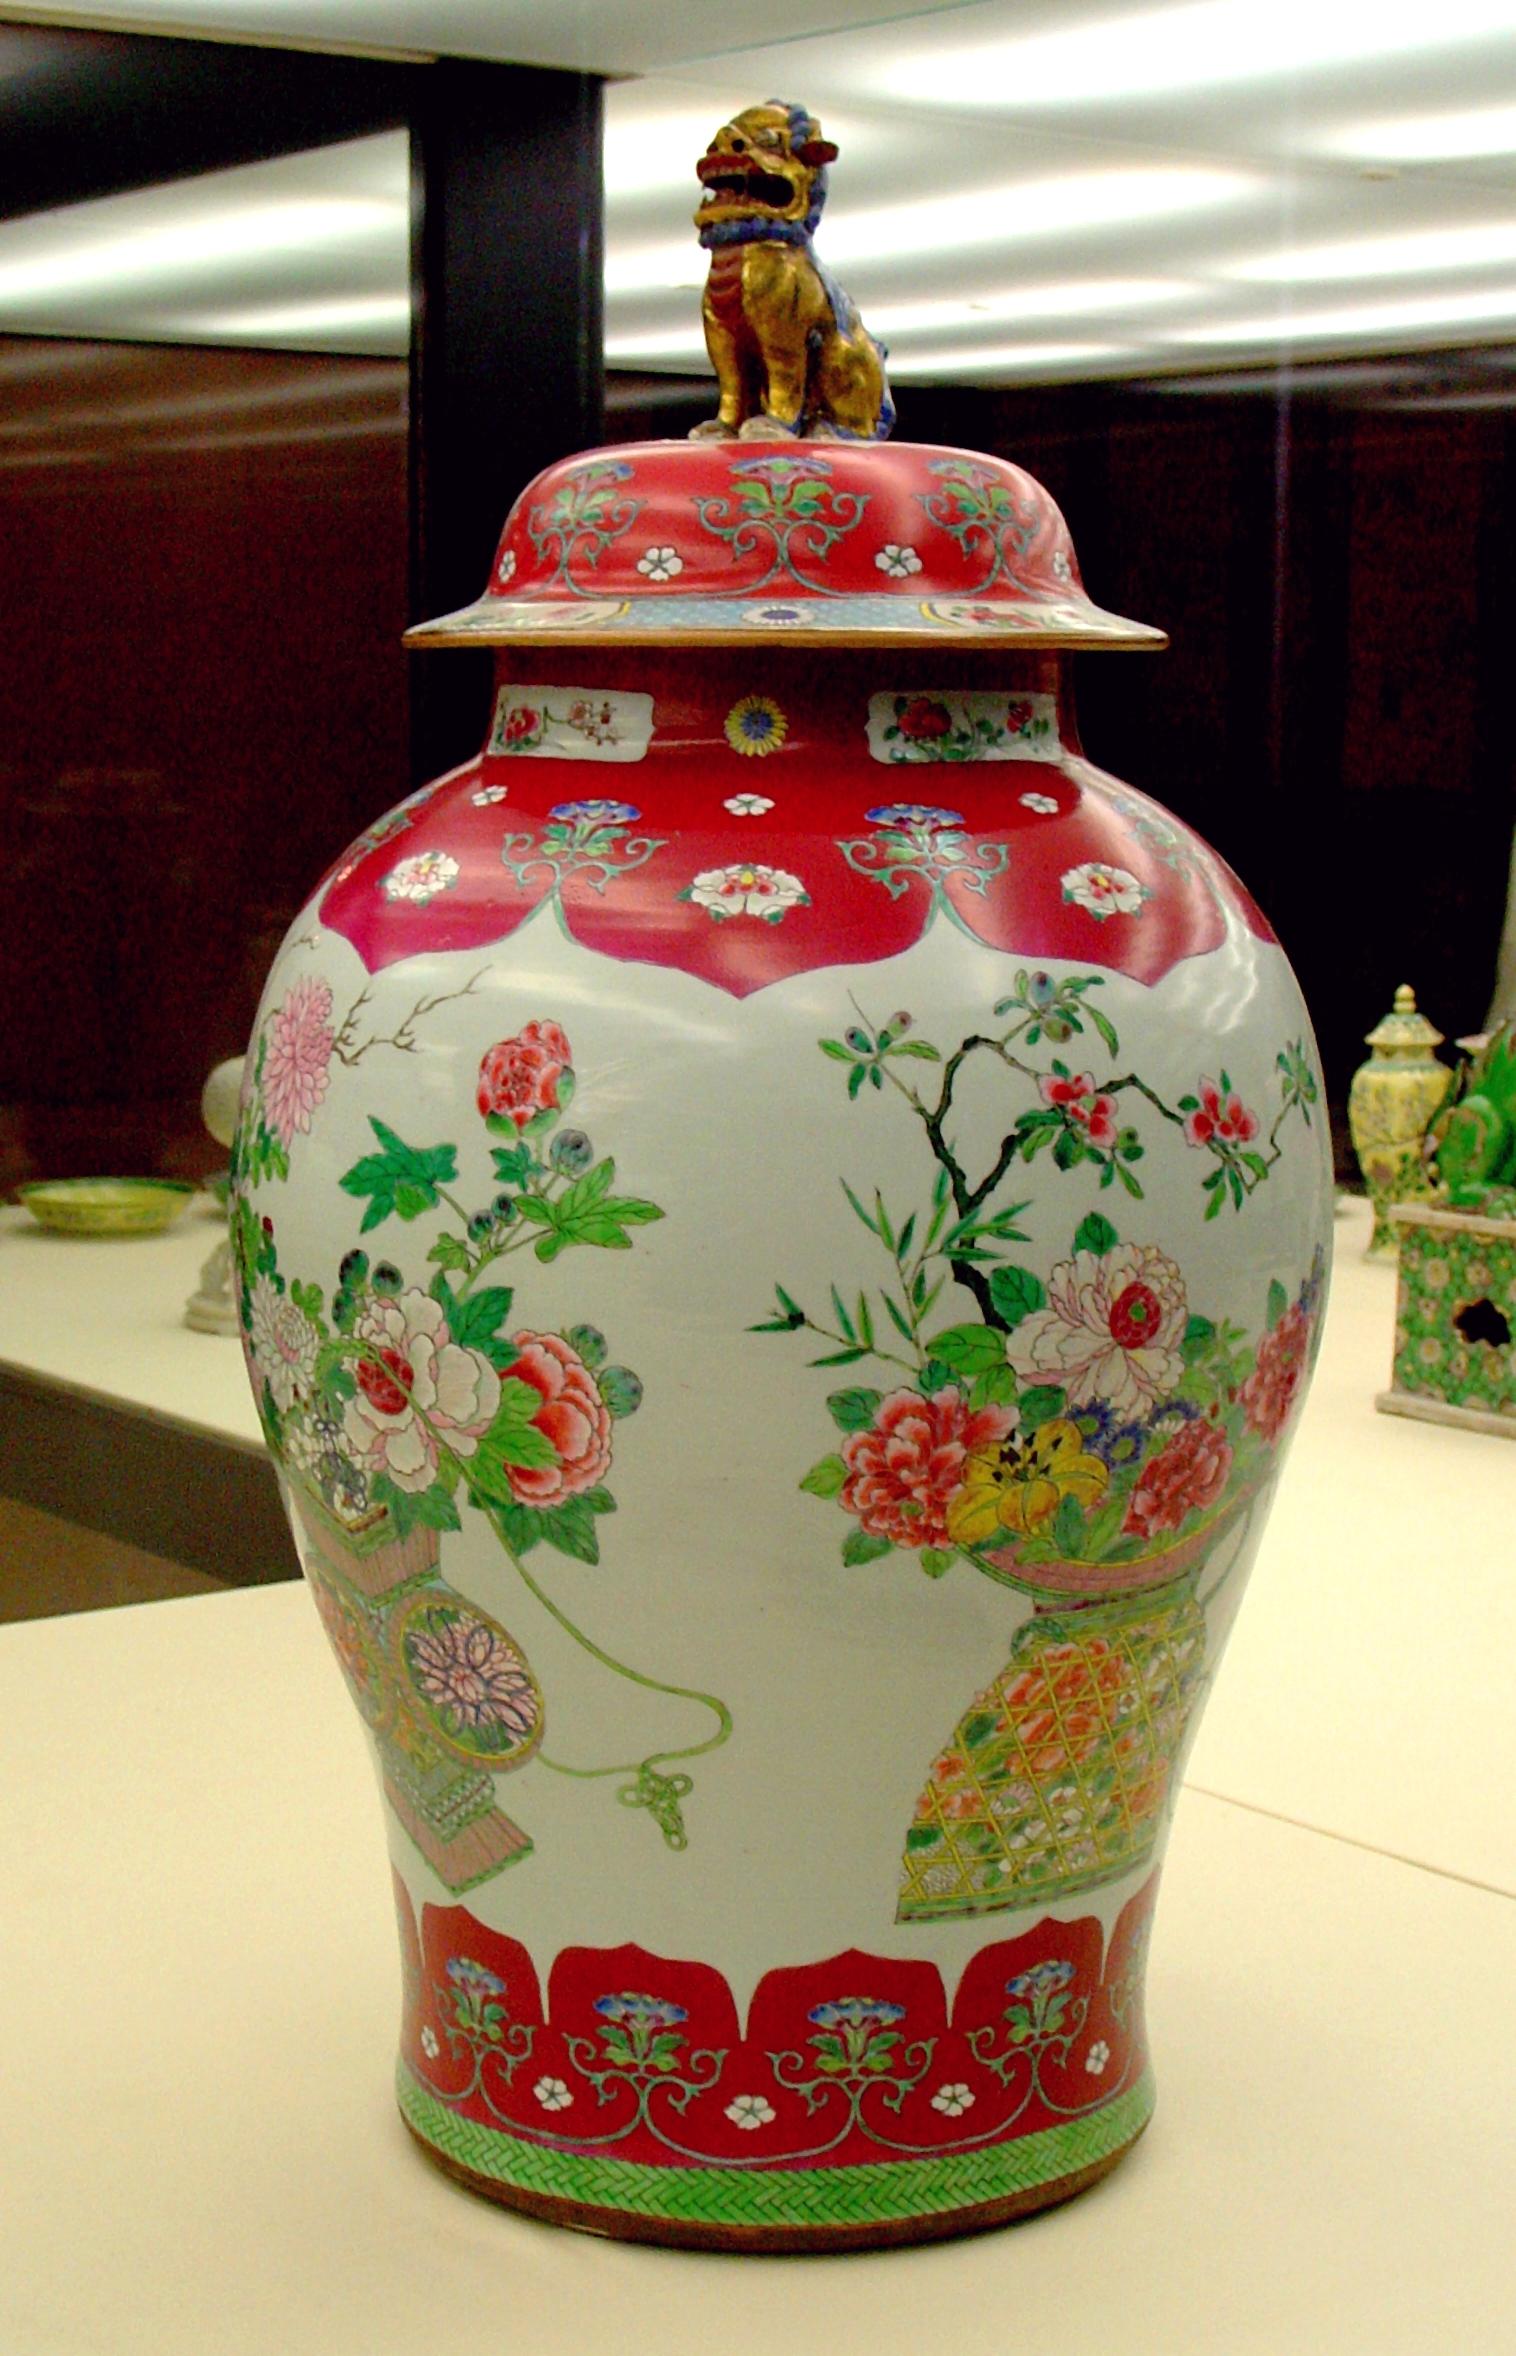 File:Porcelain Qing dynasty - Calouste Gulbenkian museum.